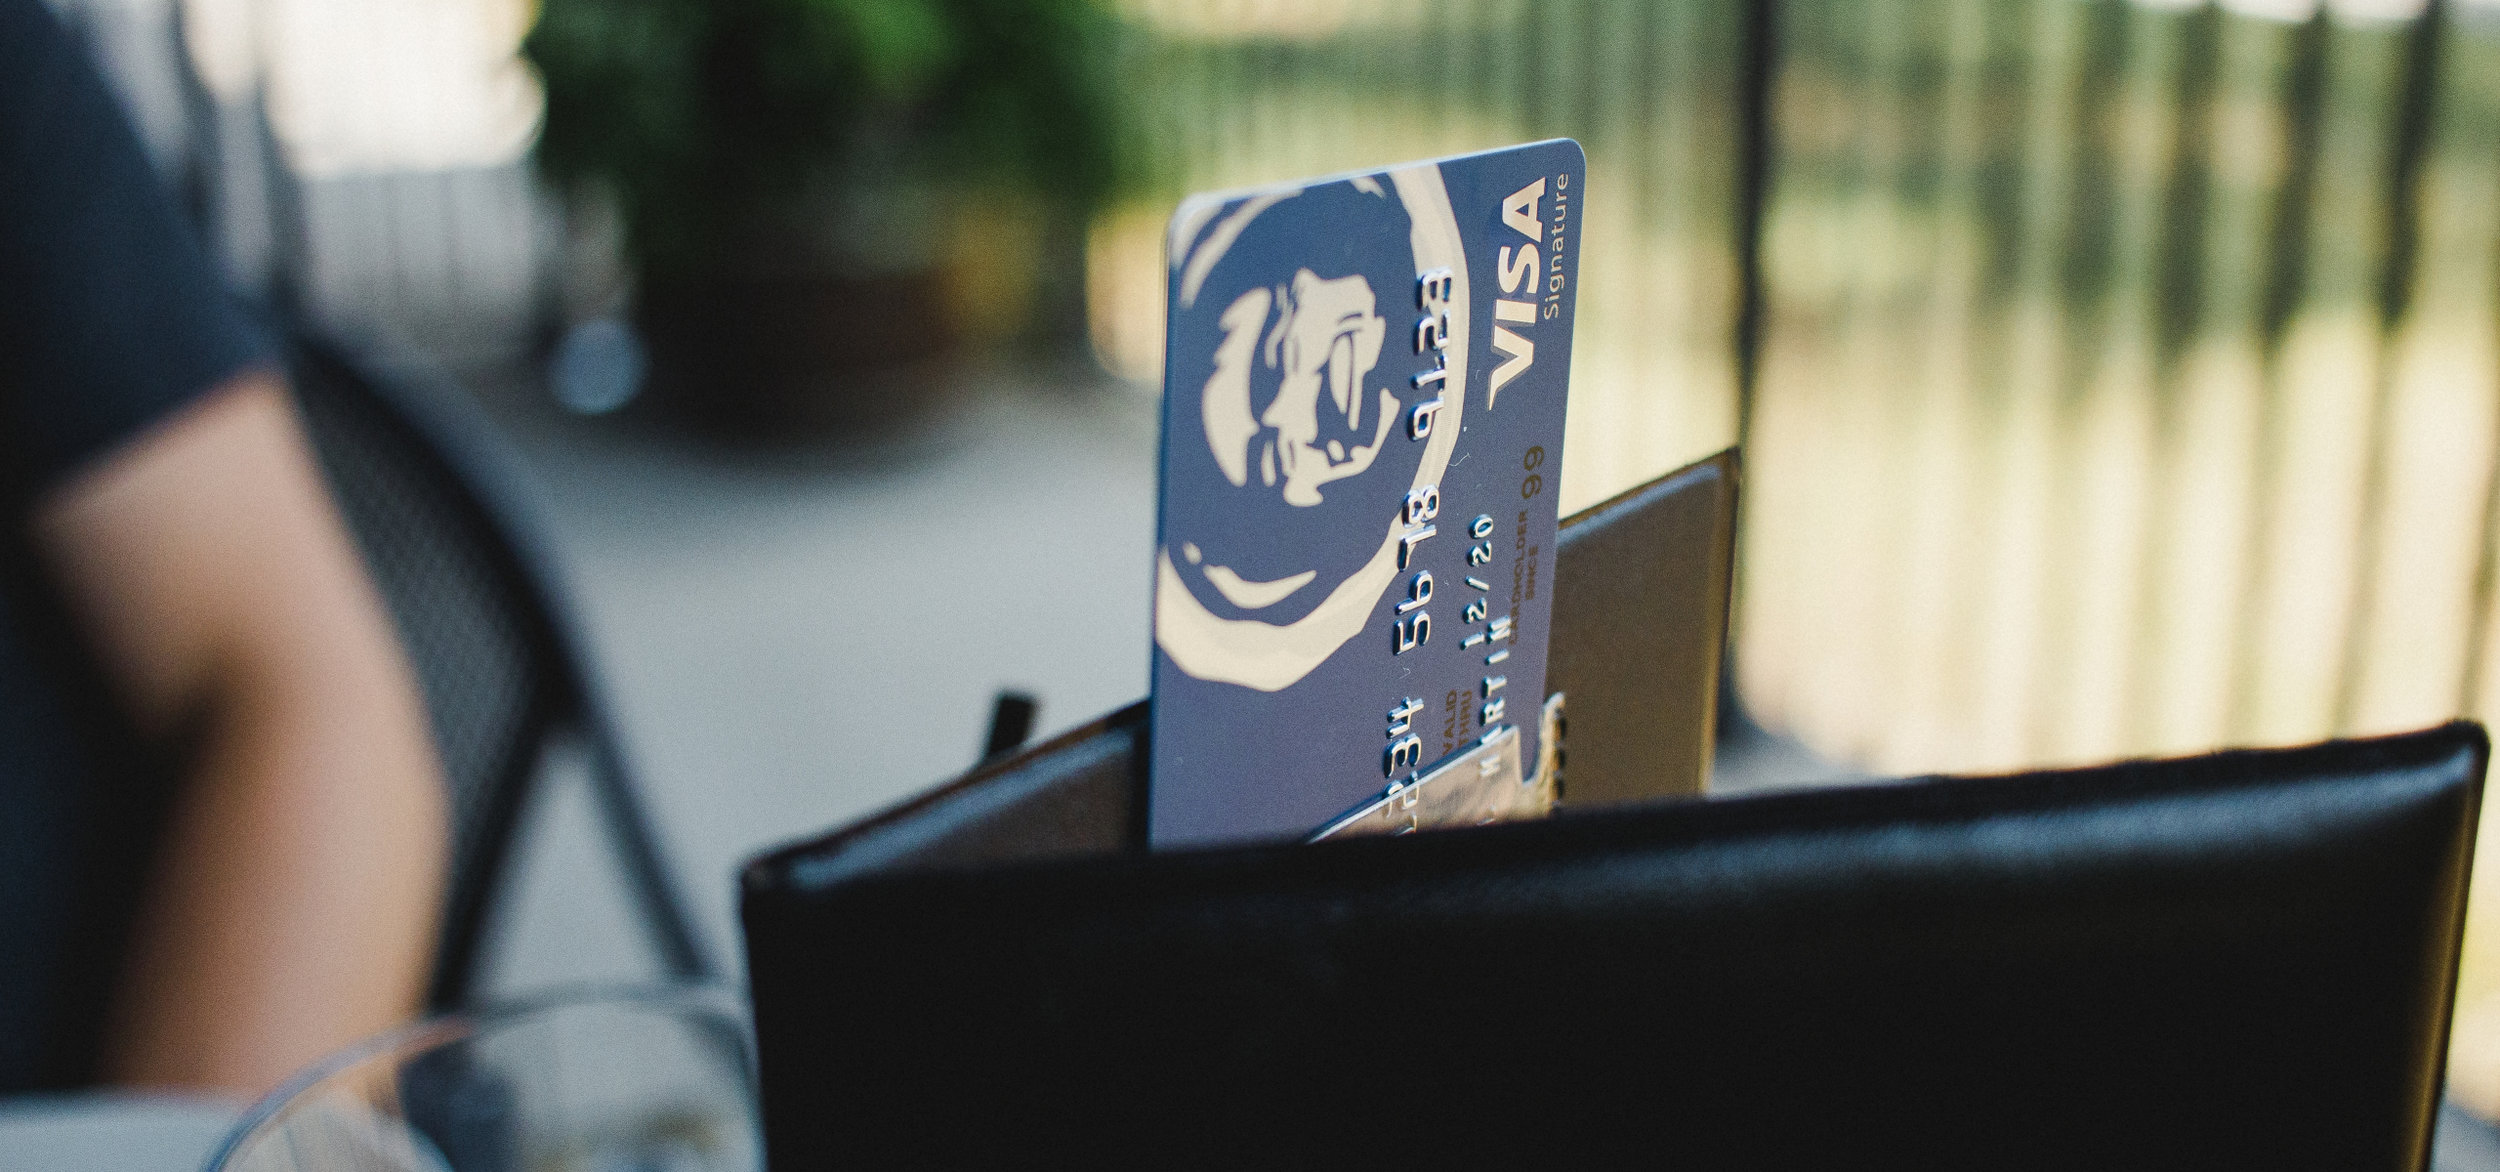 fs_creditcard_121516_09.jpg